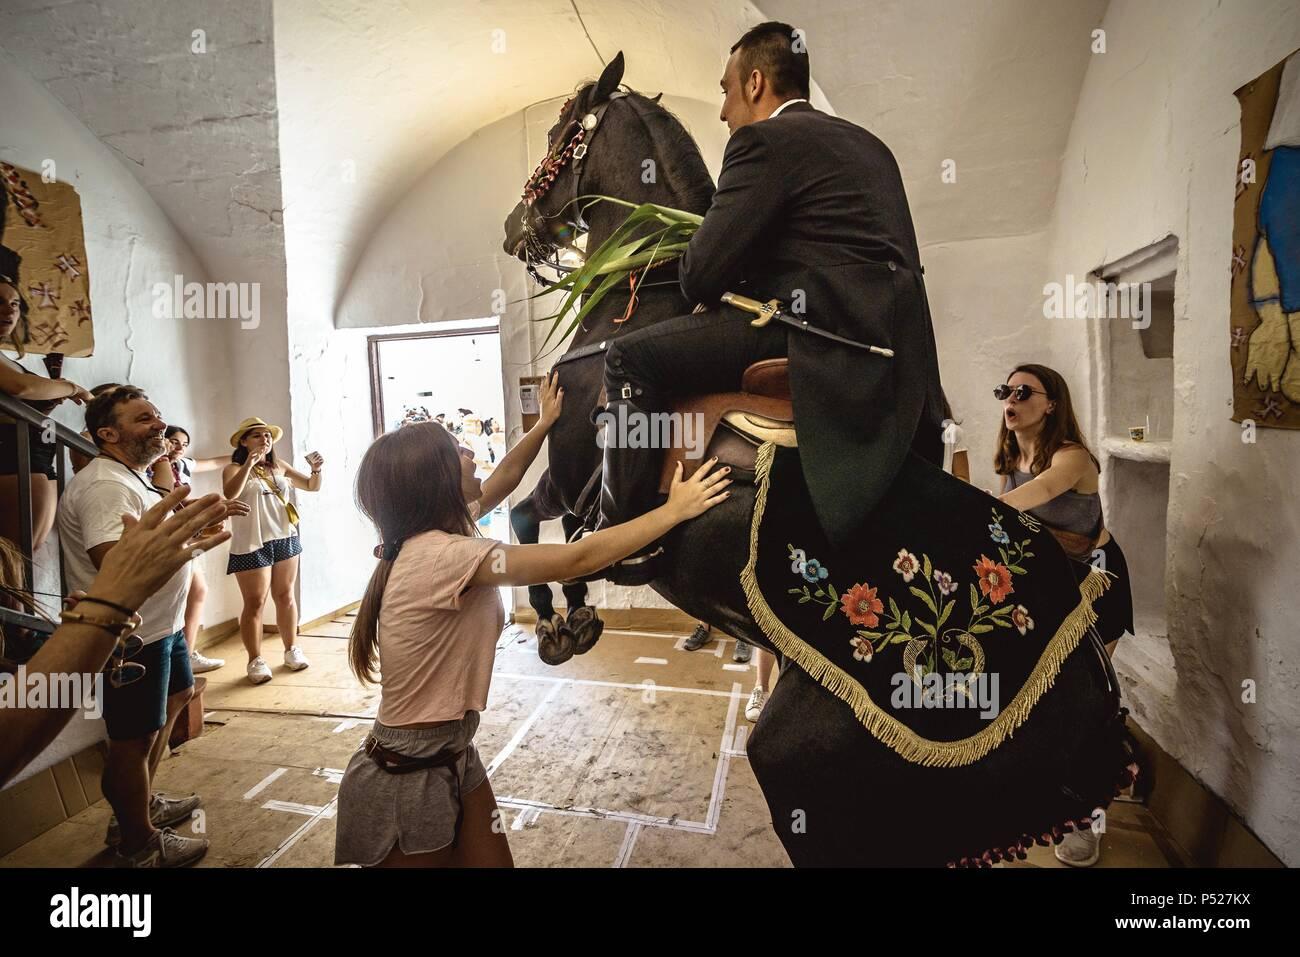 Ciutadella, Spain. 24 June, 2018:  A 'caixer' (horse rider) rears up on his horse in a private house during the 'Caragol de Santa Clara' during the traditional 'Sant Joan' (Saint John) festival in Ciutadella de Menorca Credit: Matthias Oesterle/Alamy Live News - Stock Image